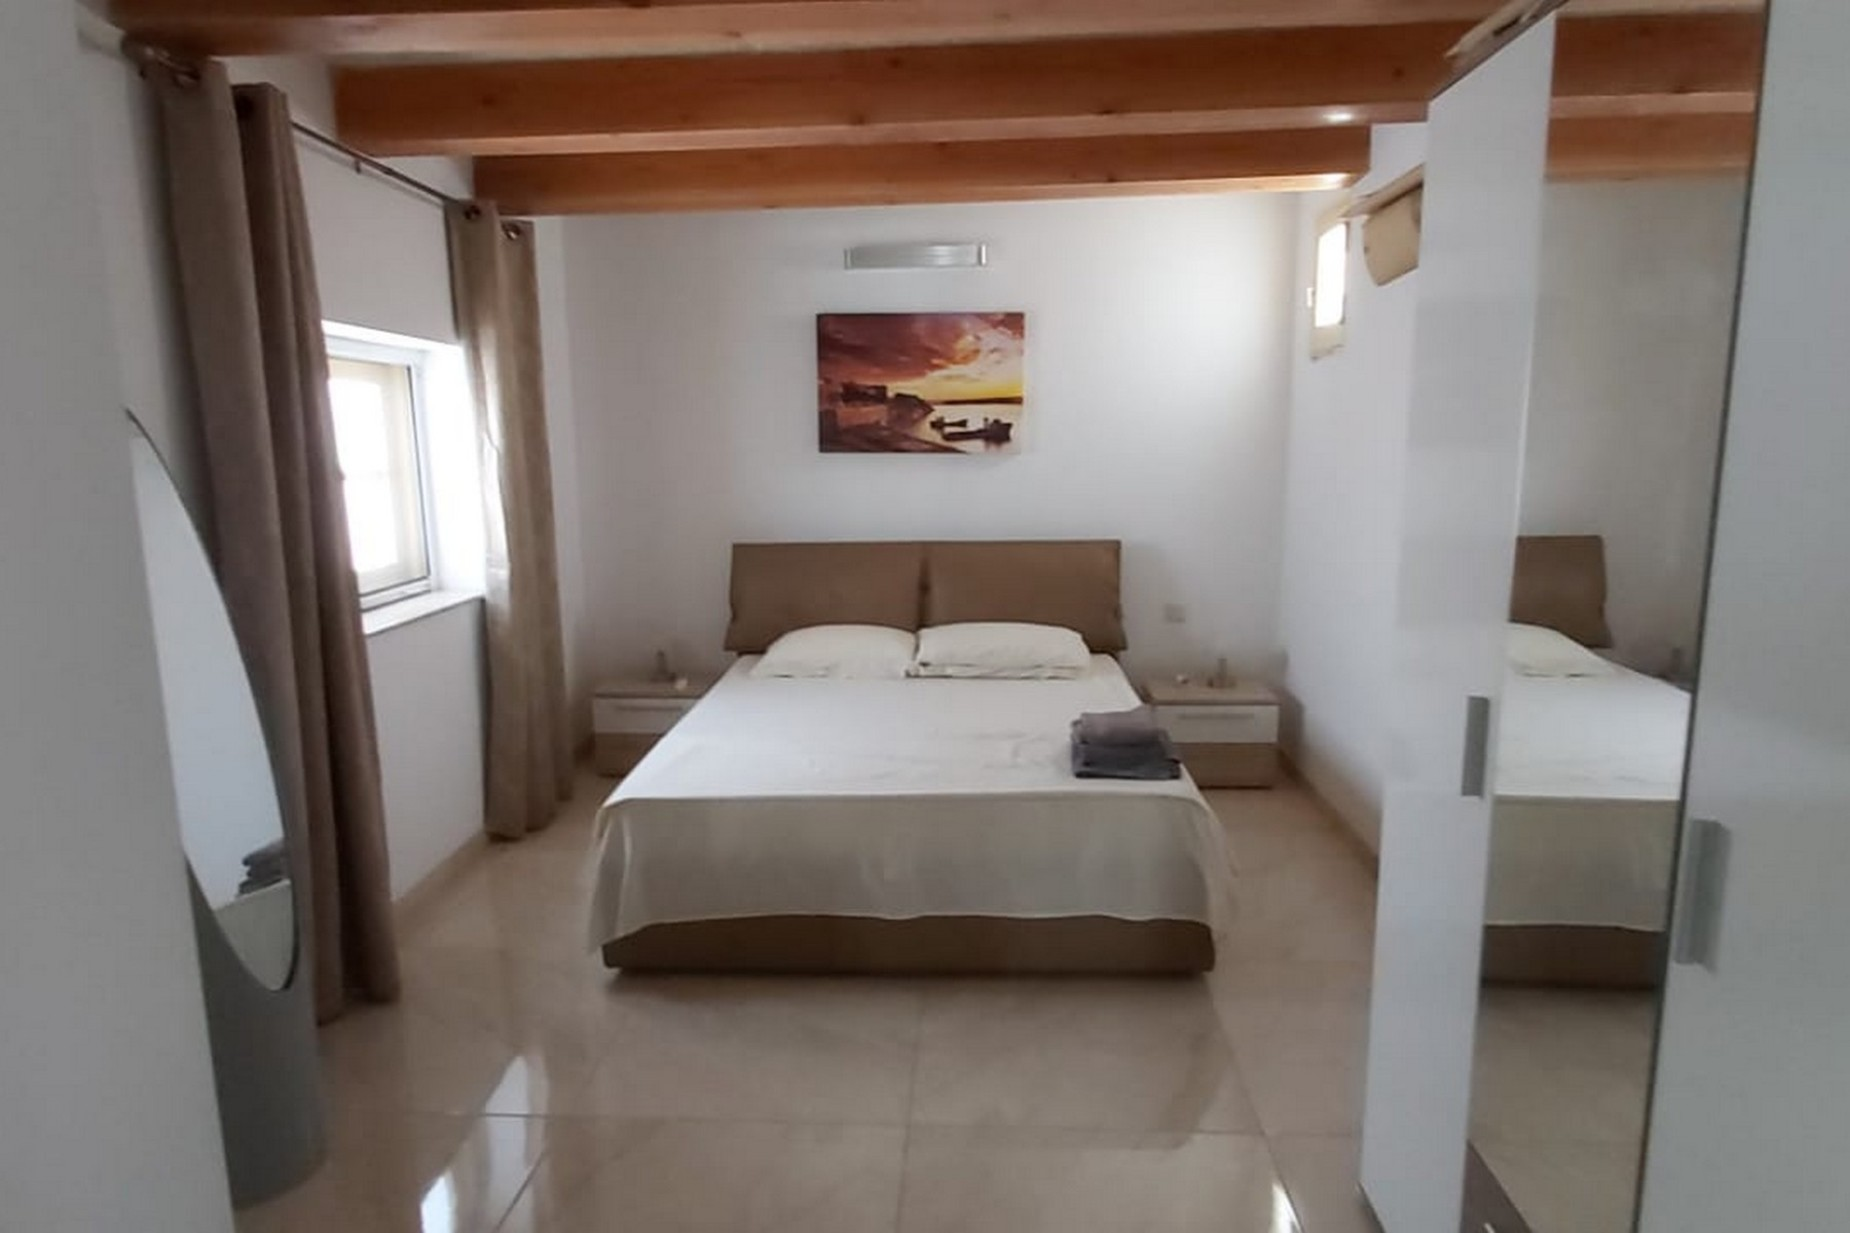 4 bed  For Sale in Valletta, Valletta - thumb 14